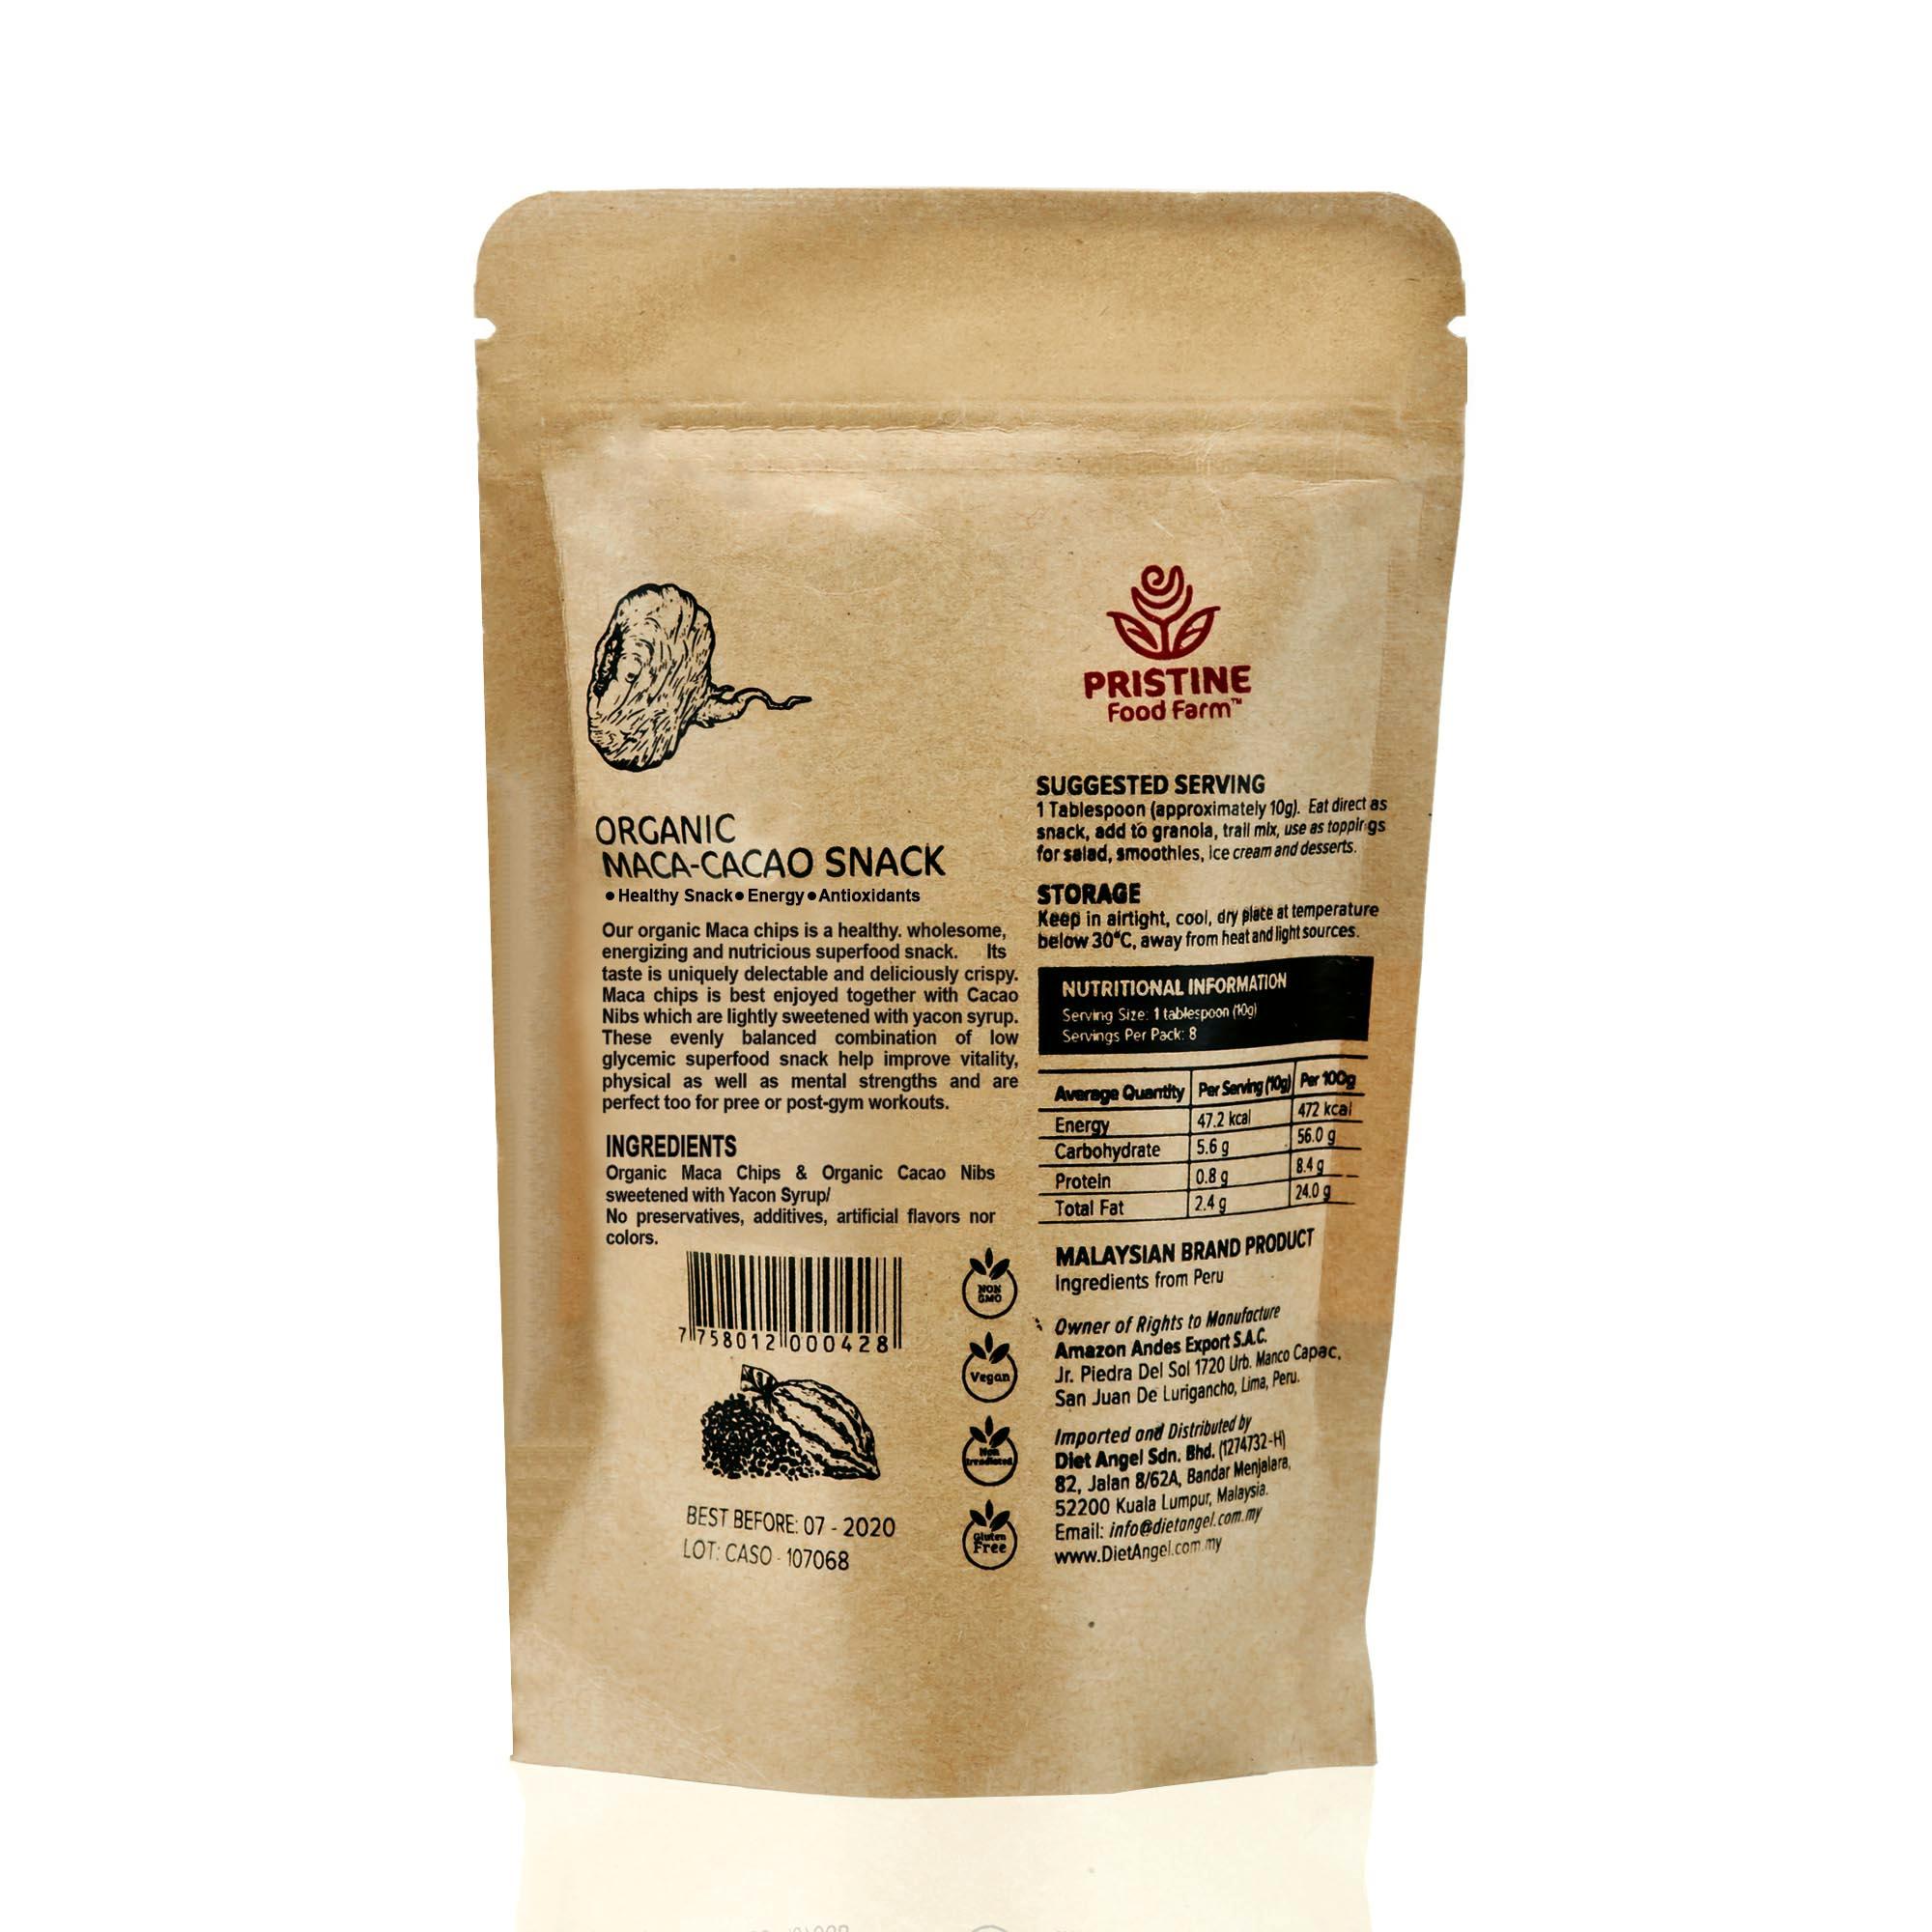 [MPLUS] Pristine Food Farm Organic Maca-Cacao Snack 75Gm